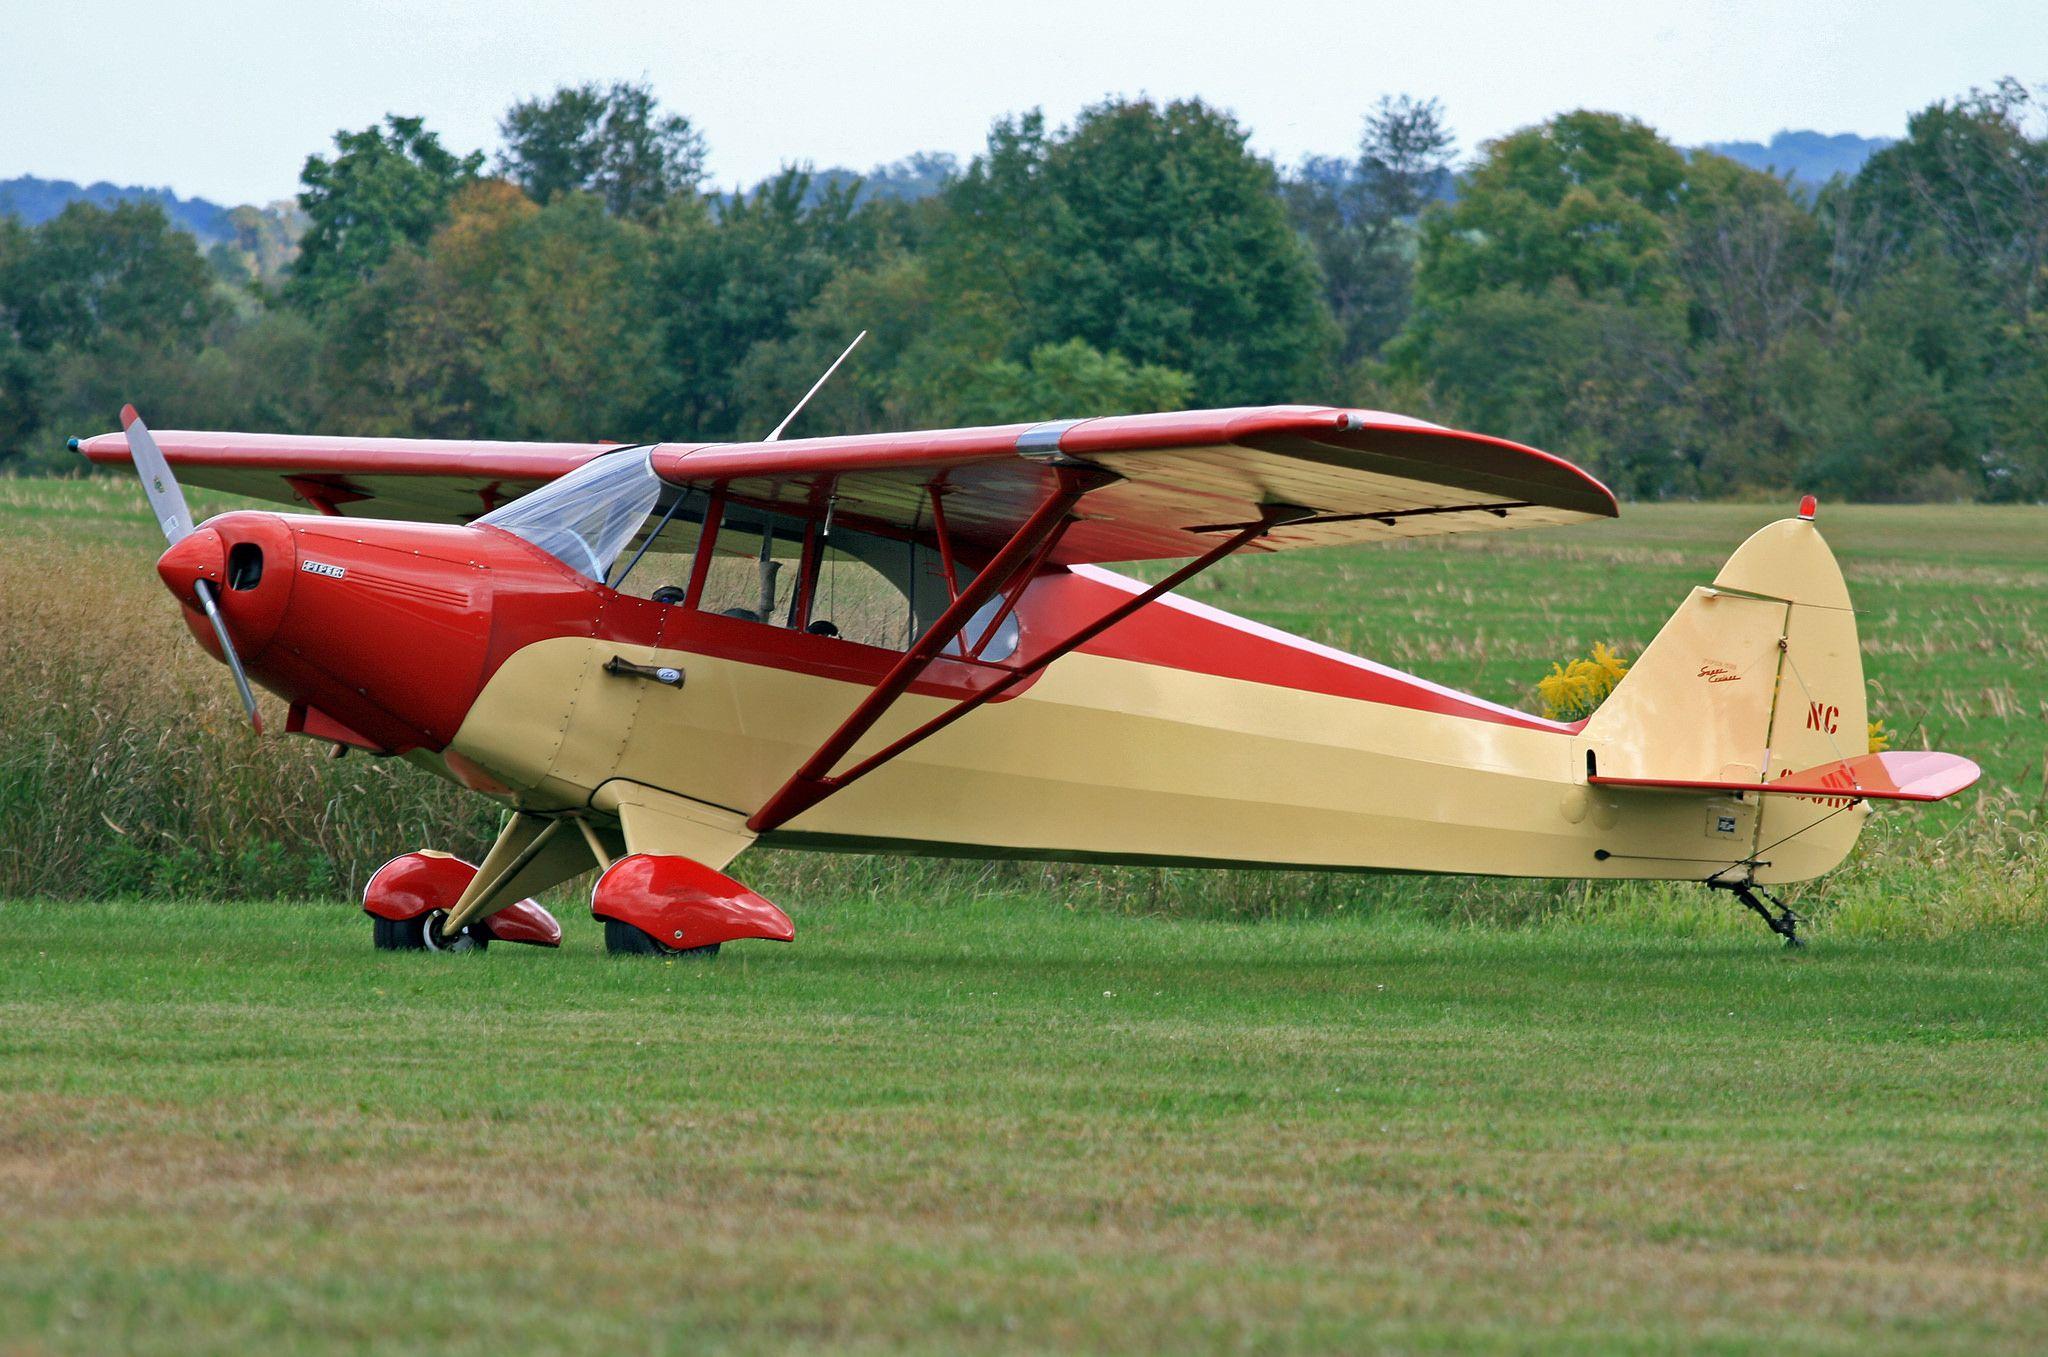 Piper PA-12 Super Cruiser (NC2555M)   Airplanes and      Piper